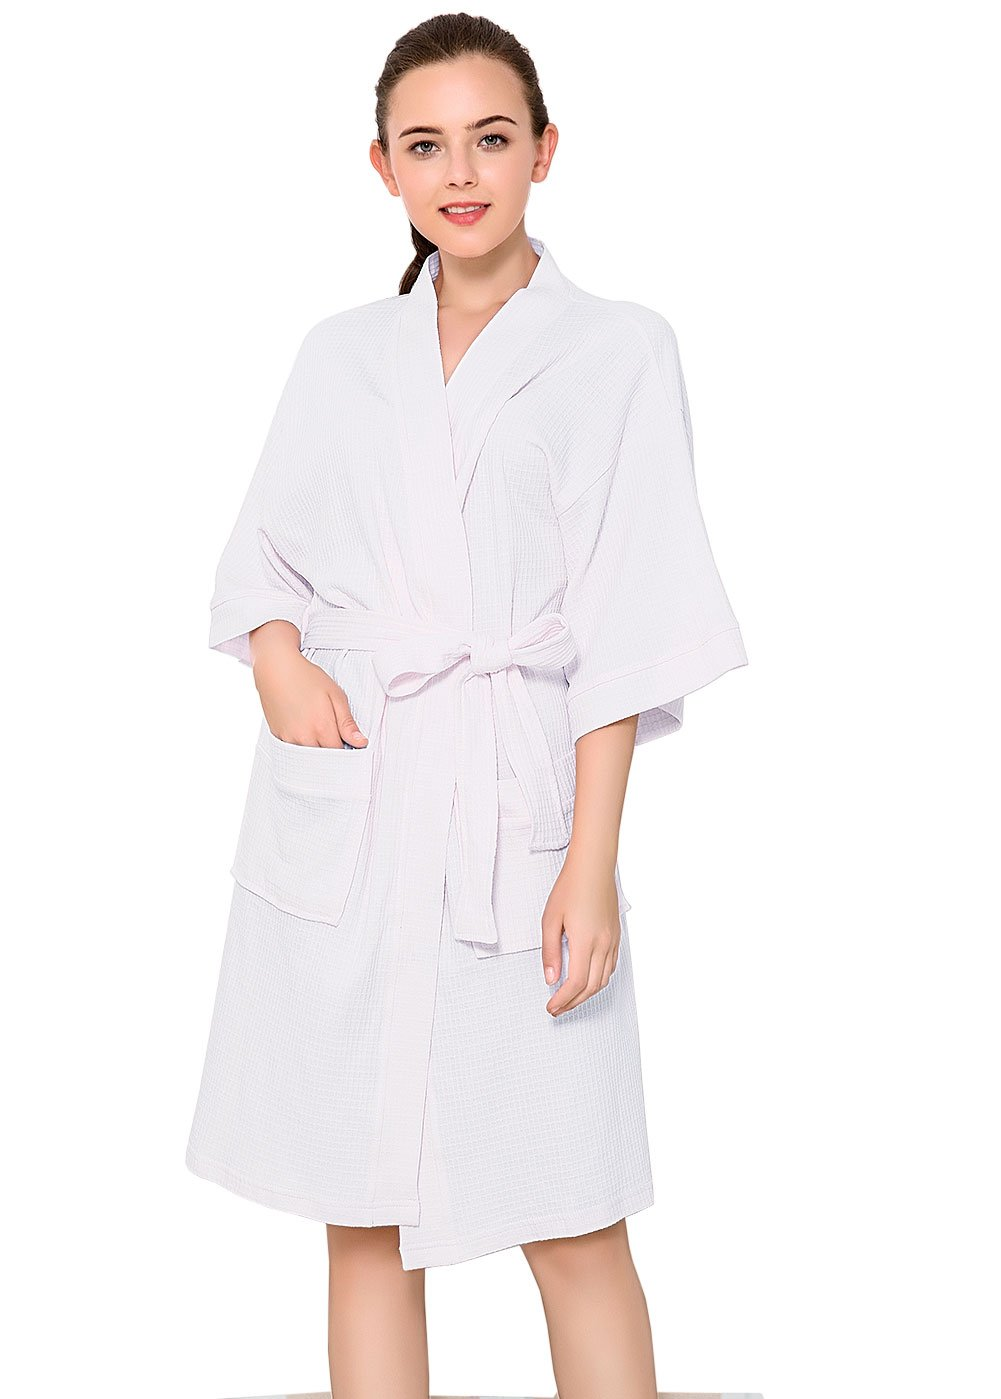 Artfasion Womens Lightweight Robe Kimono Waffle Spa Bathrobe Cotton Belted with Pockets